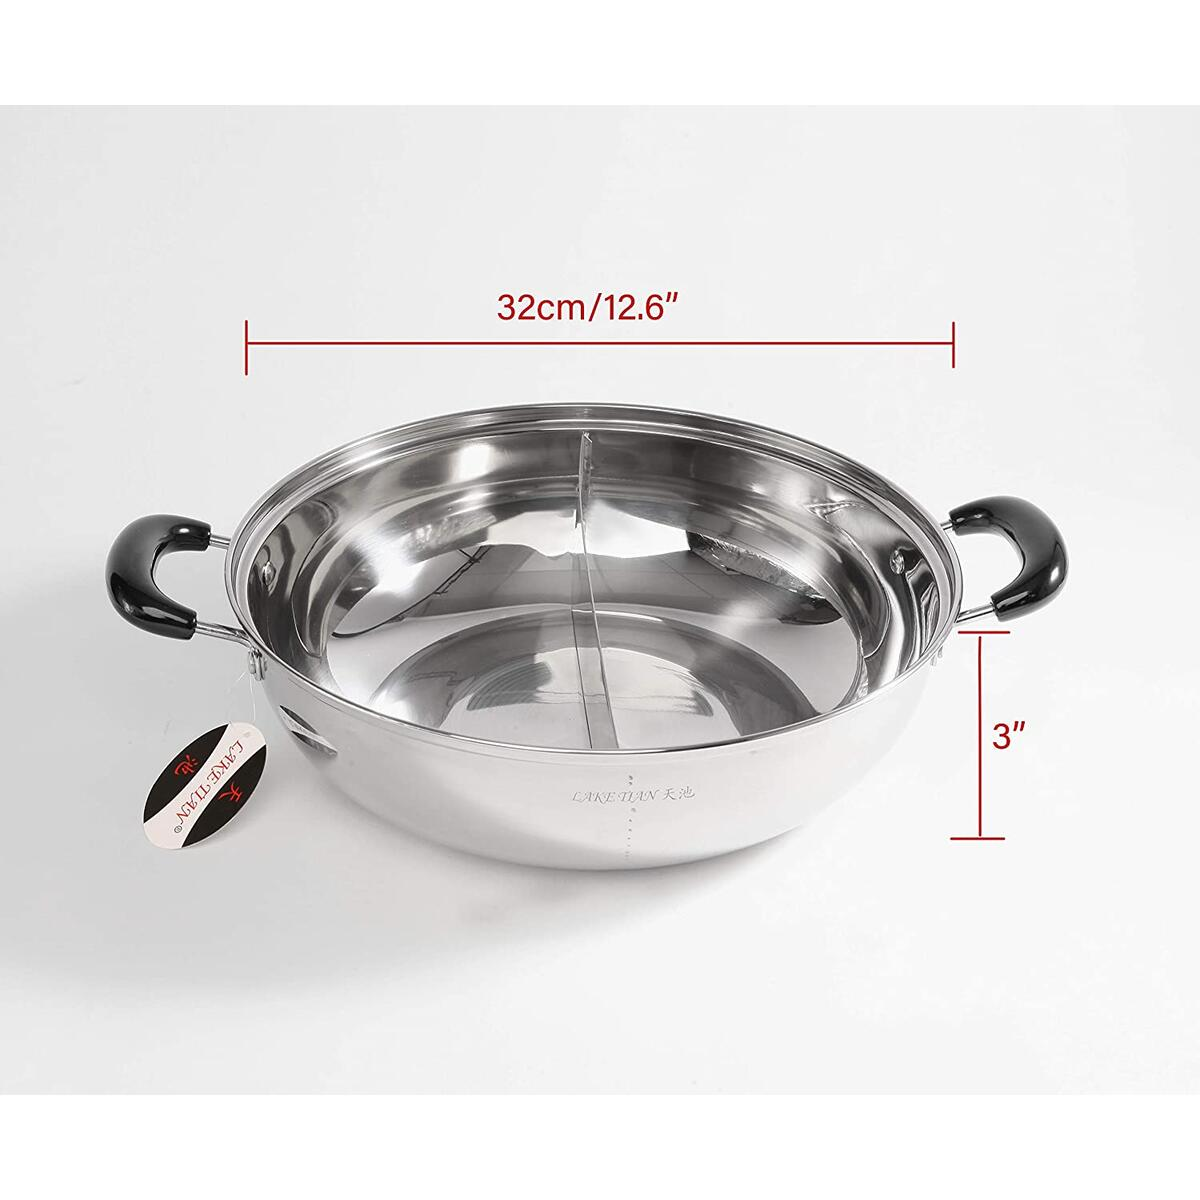 Stainless Steel Shabu Shabu Hot Pot, Dual Sided Yin Yang Hot Pot with Divider